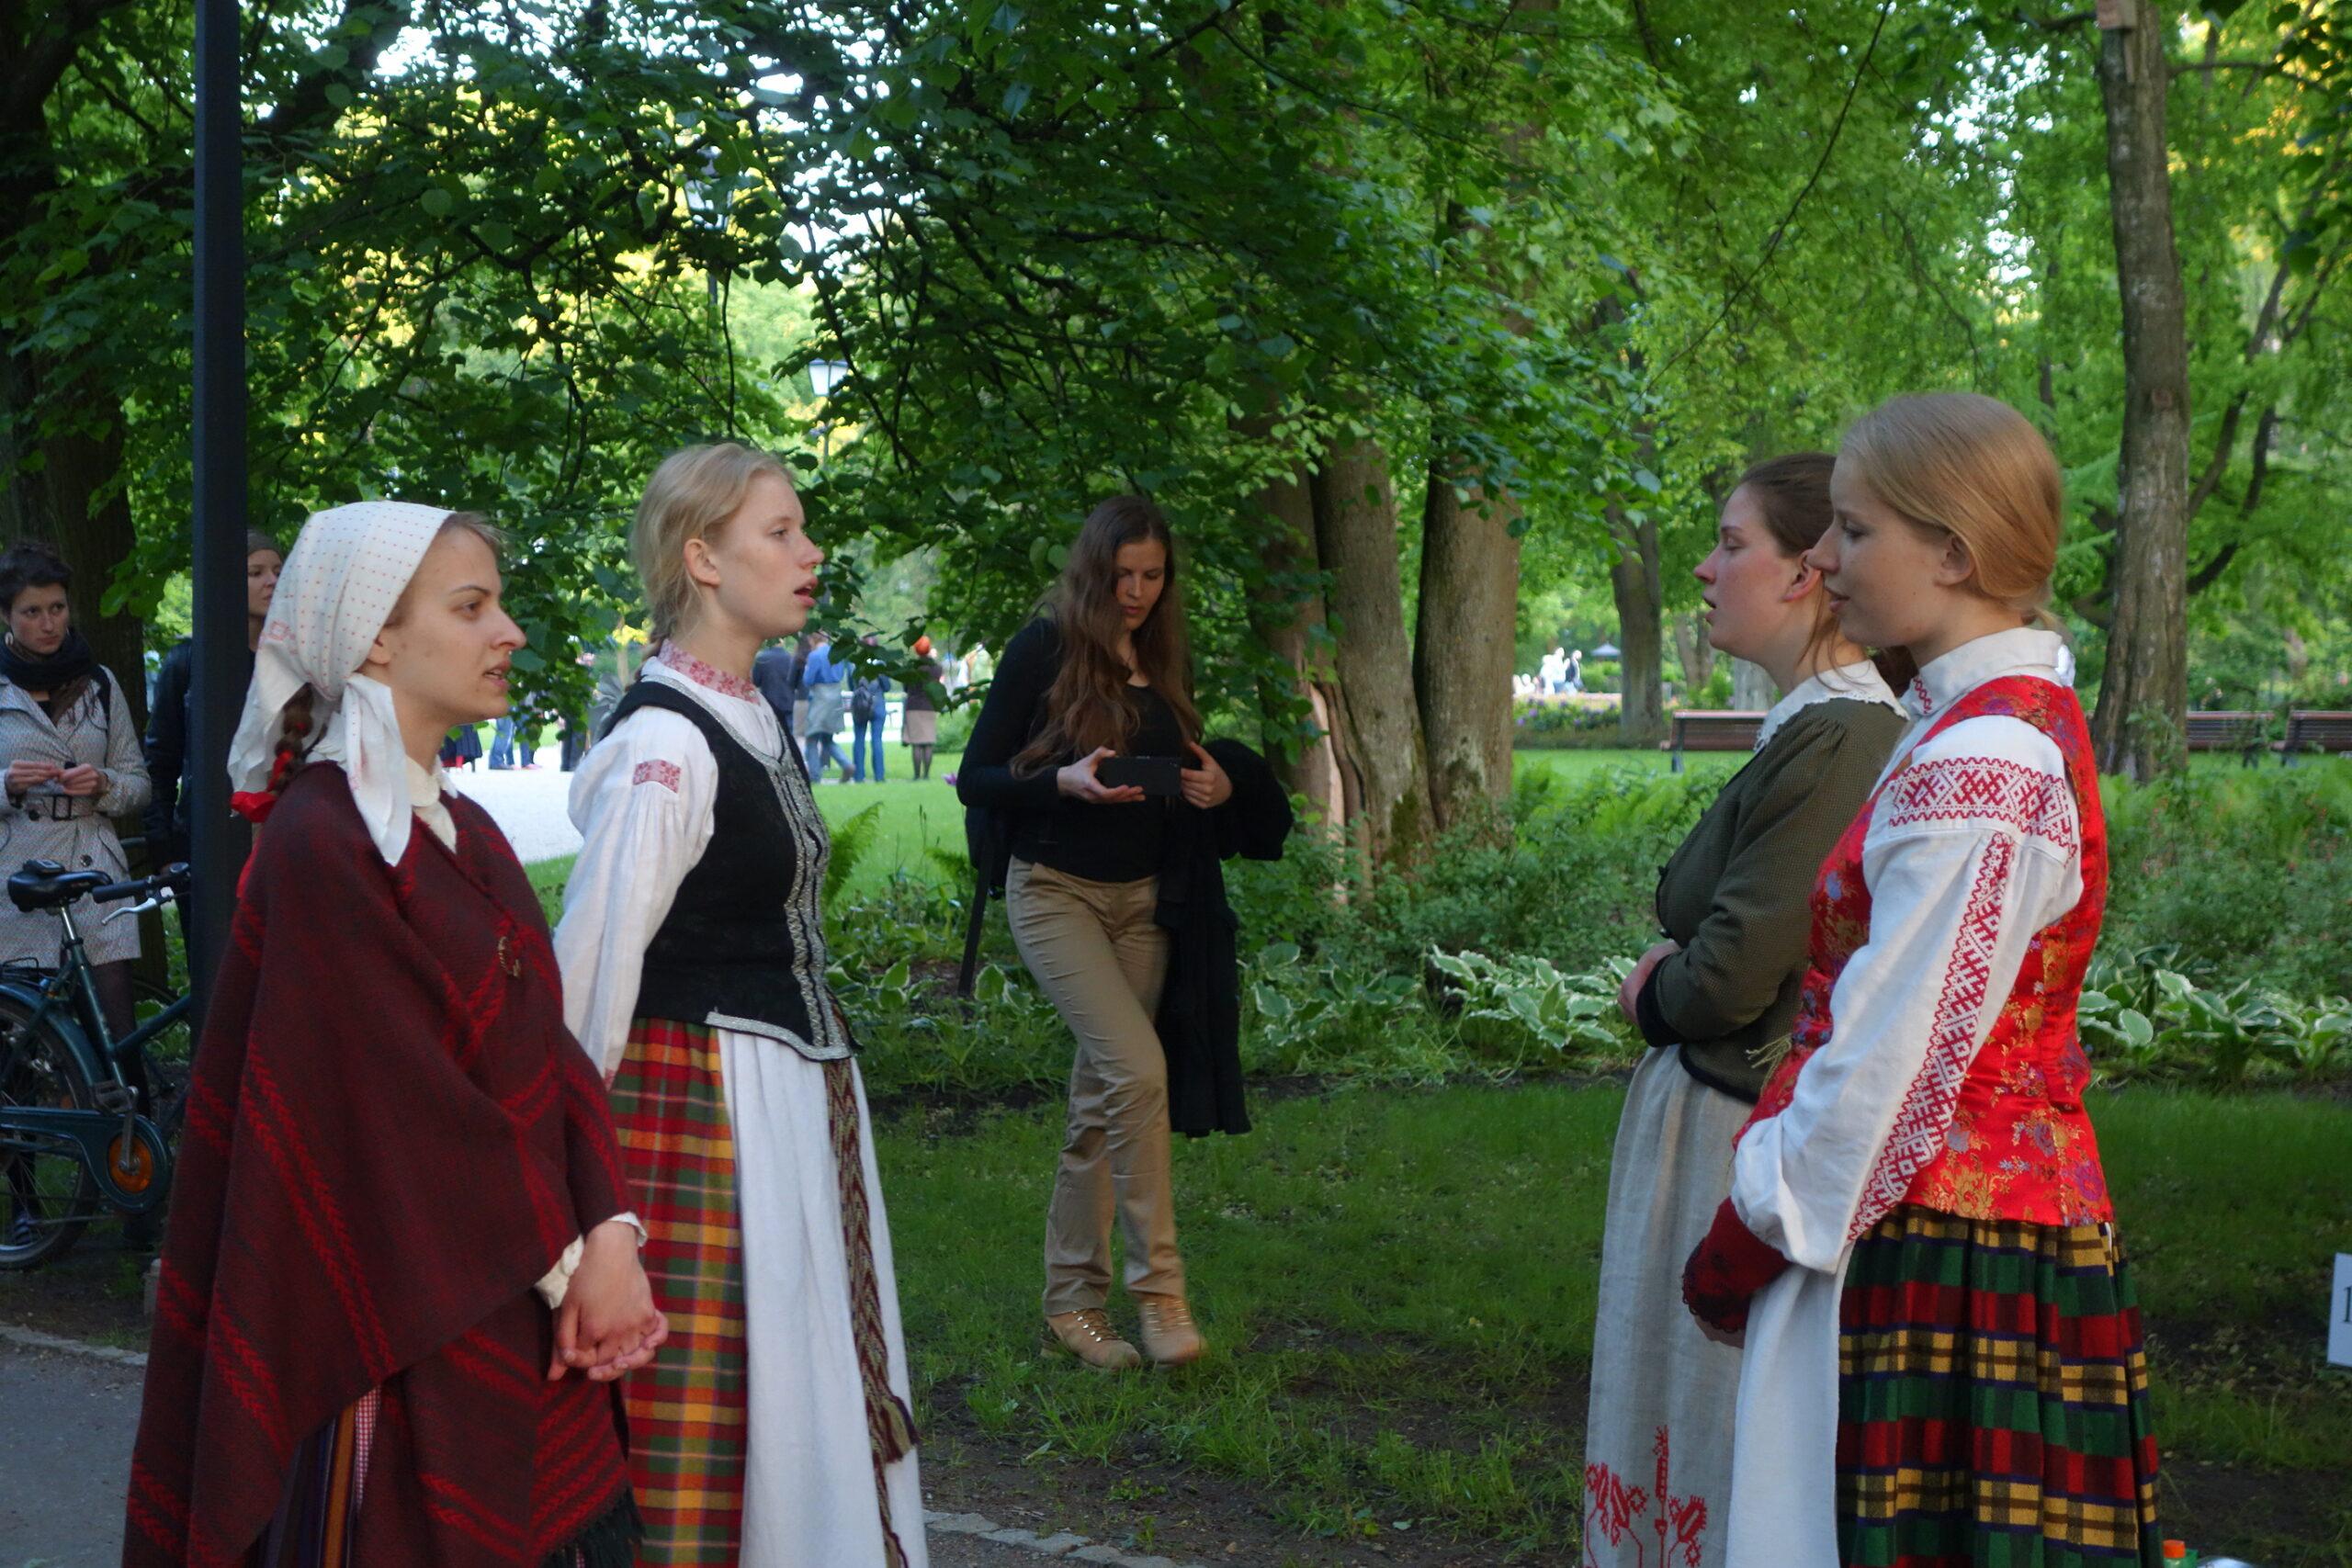 Emilija Vaiginyté, Vera Venckūnaitė-Čepulienė, Teresė Andrijauskaitė ja Milda Andrijauskaitė-Bakanauskienė laulavat liettualaisia sutartinės-lauluja Vilnassa vuonna 2015. Kuvaajana toimi Pekka Huttu-Hiltunen.